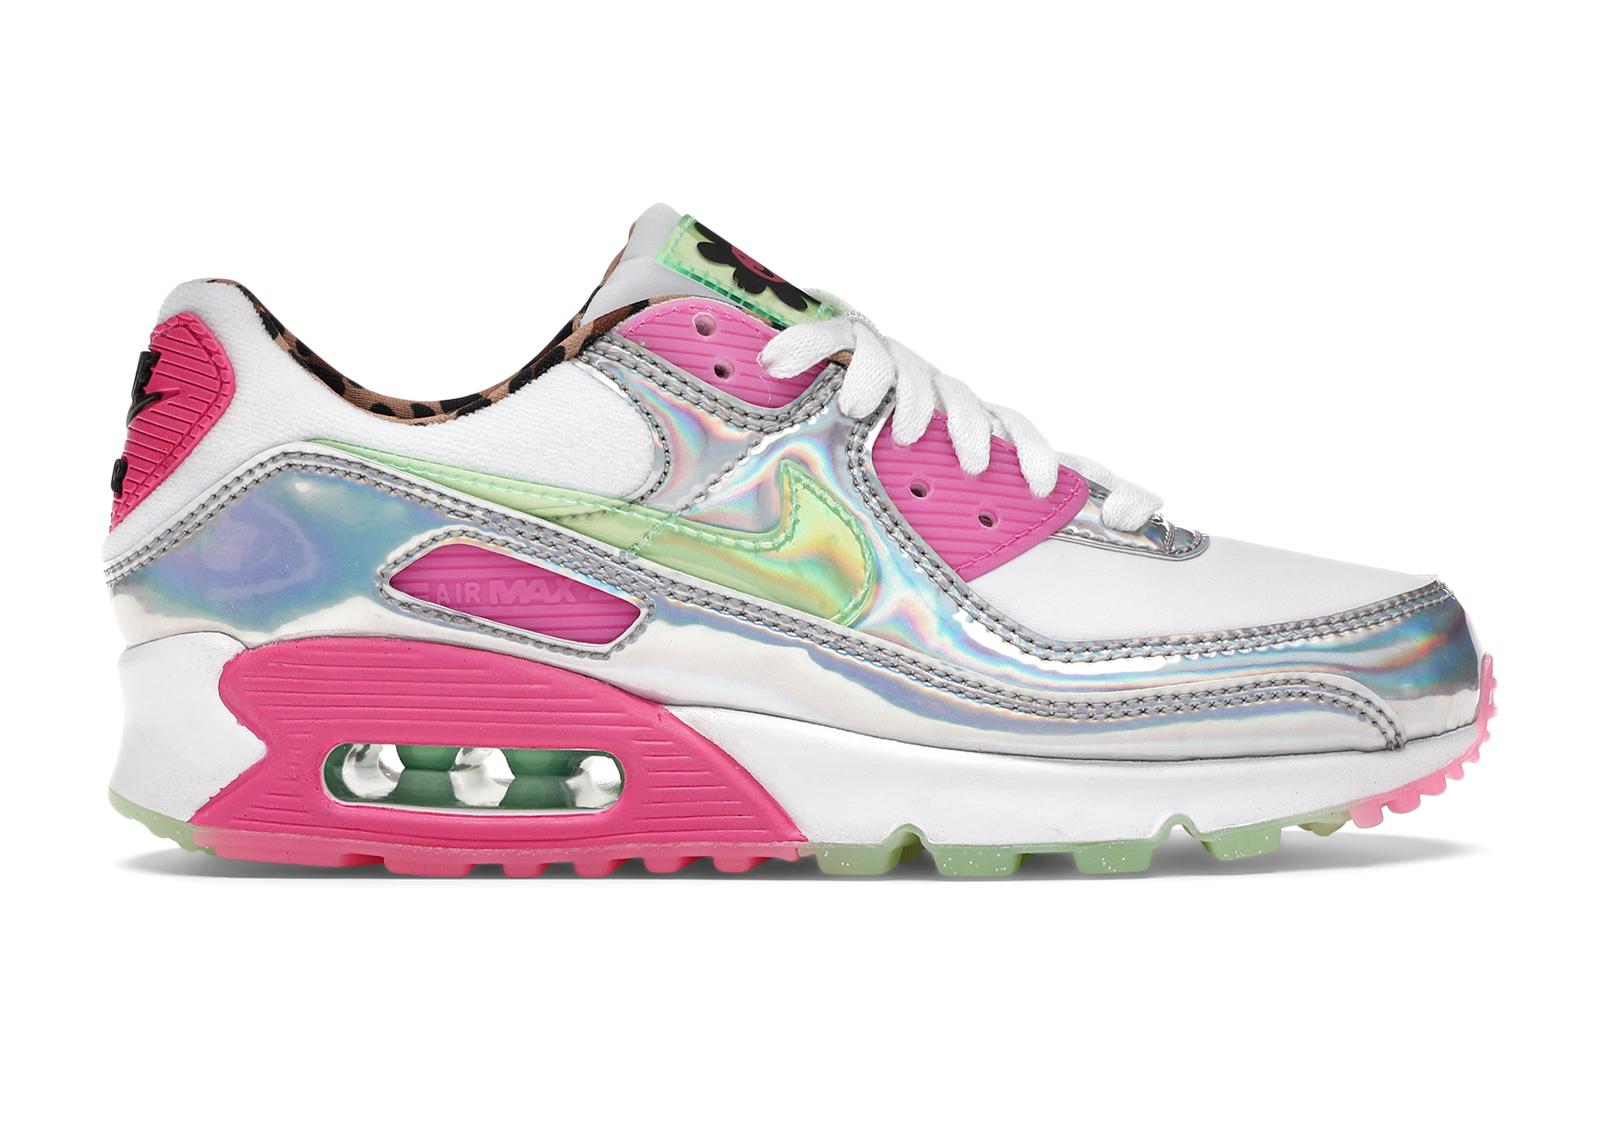 Nike Air Max 90 LX Daisy Leopard Iridescent (W)